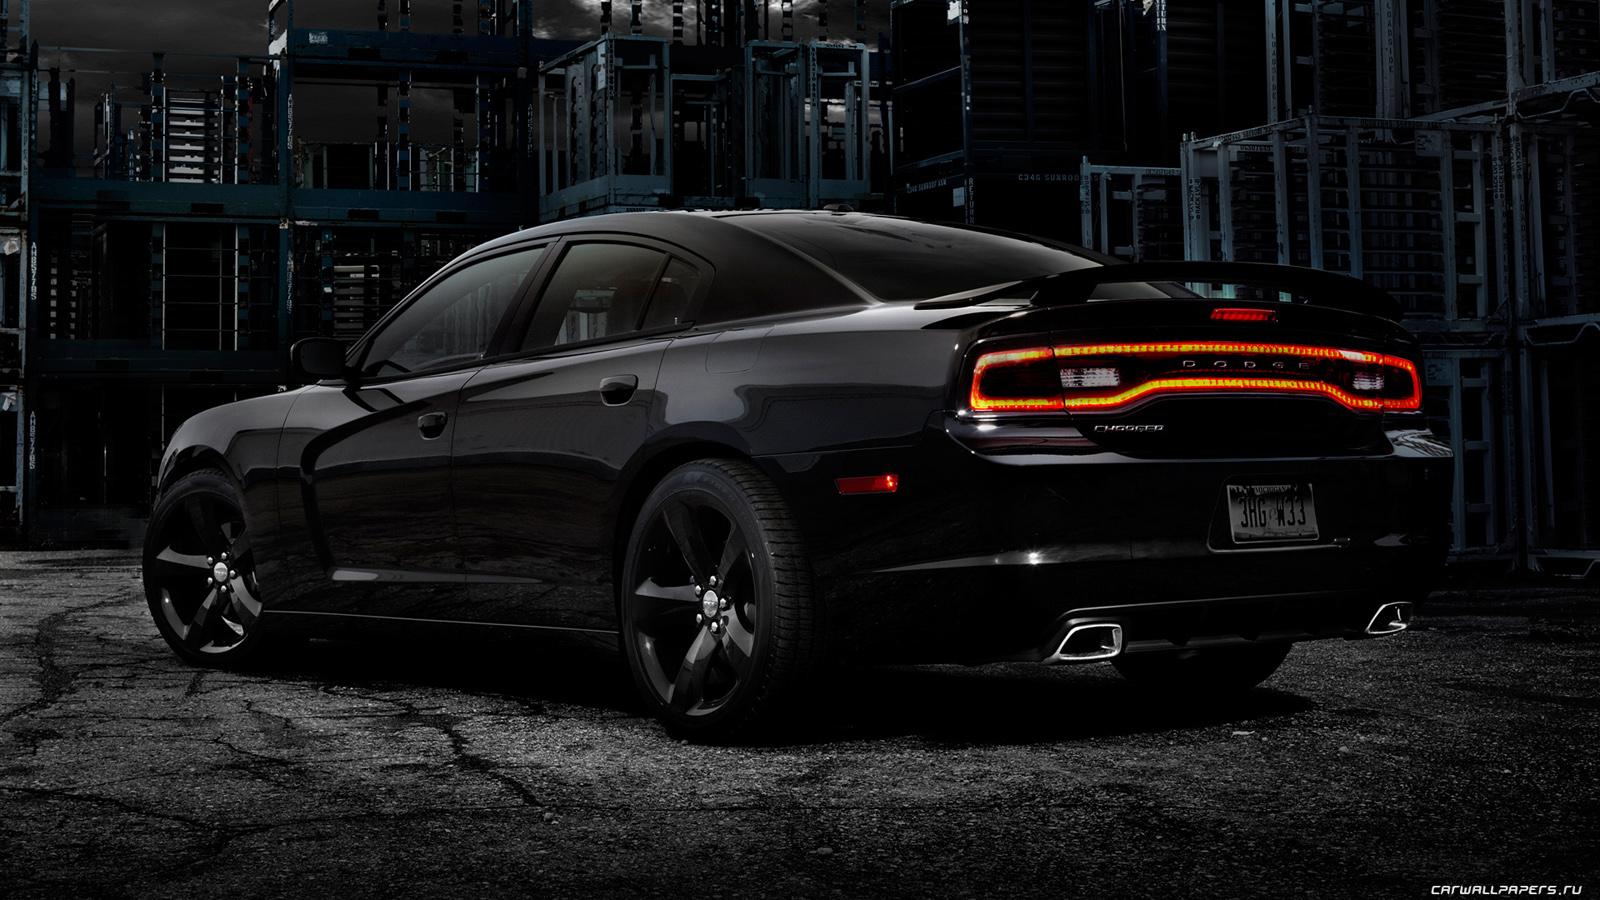 http-www-car-ru-wp-dodge-charger-blacktop-Dodge-Charger-Blacktop-x-wallpaper-wp3407055